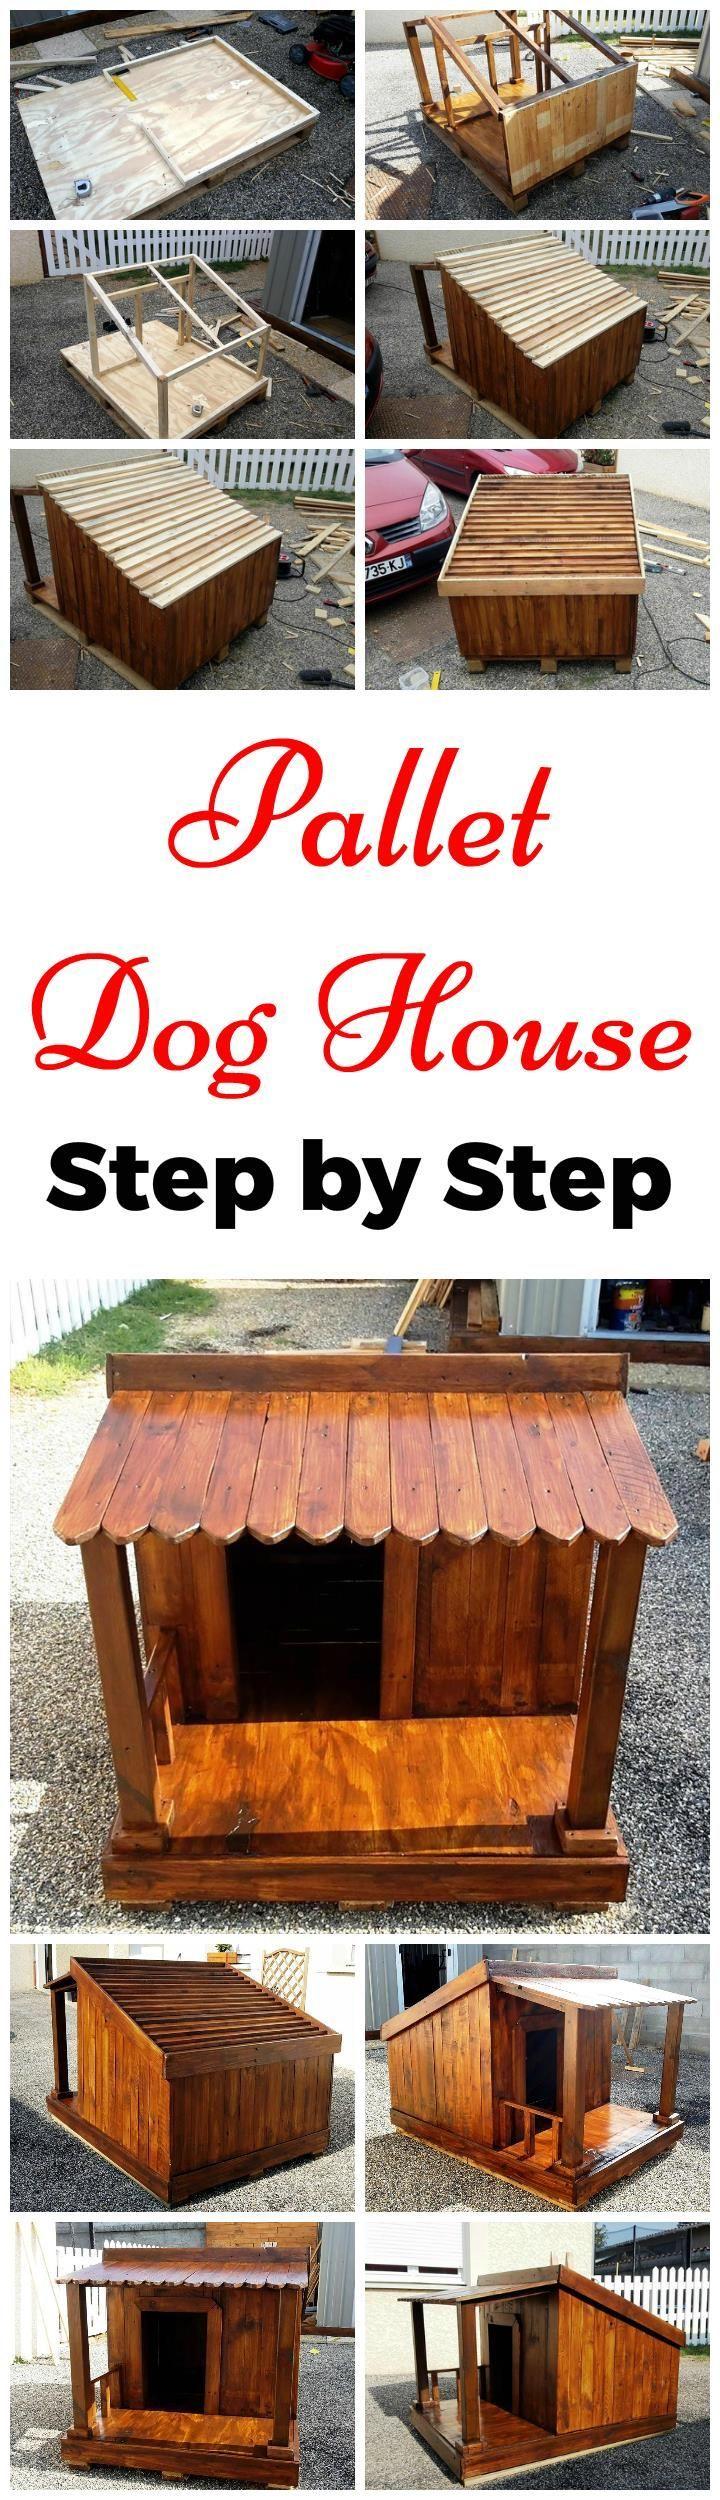 Pallet Dog House Step By Step Plan Pallet Dog House Dog House